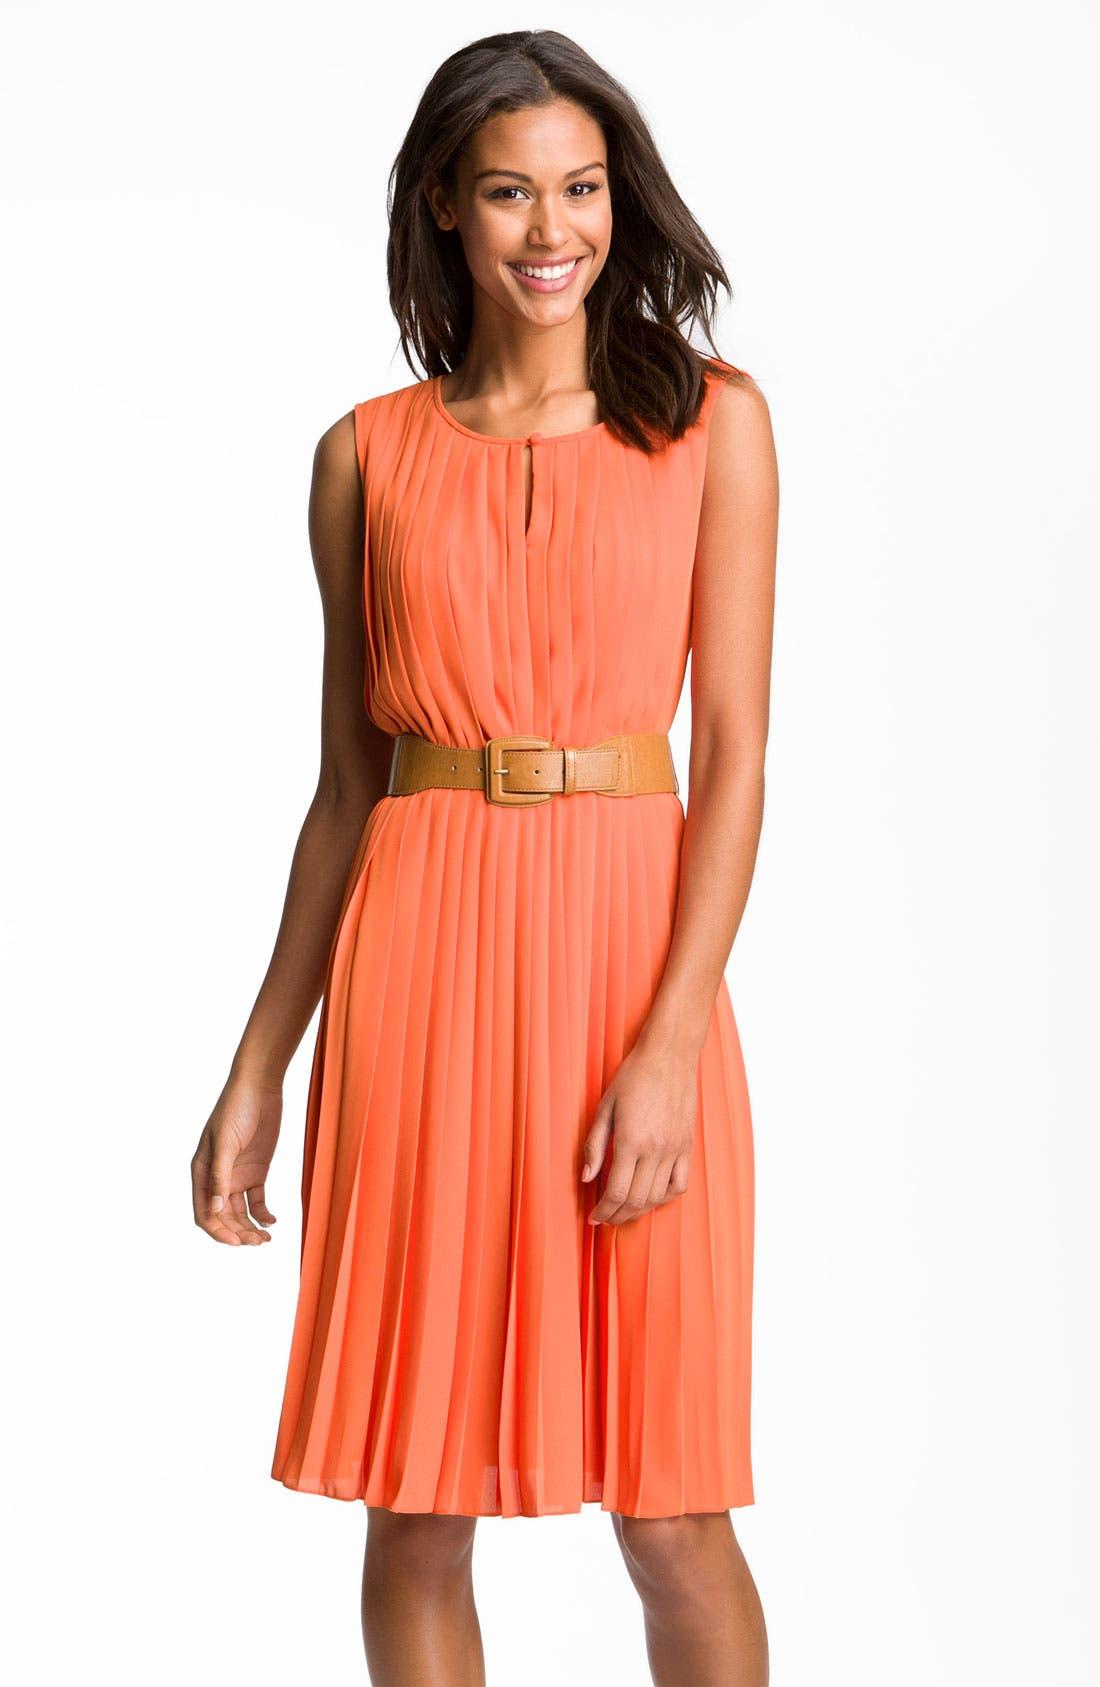 Alternate Image 1 Selected - Maggy London Sleeveless Pleated Chiffon Dress